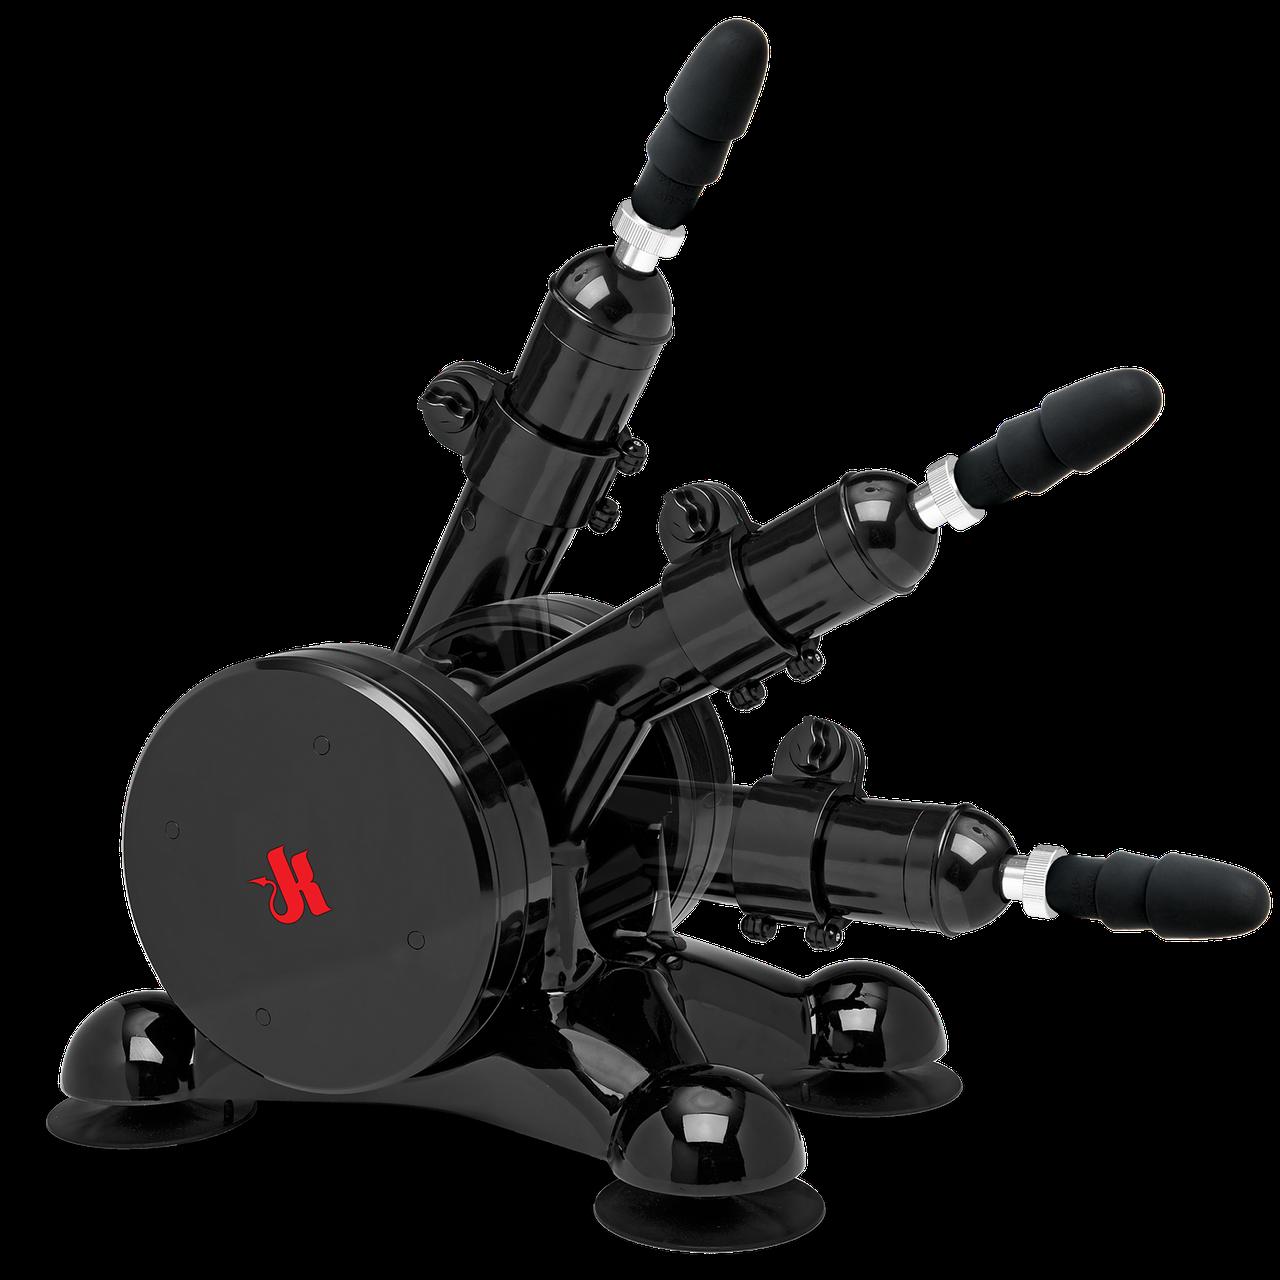 Секс машина Doc Johnson Kink - Fucking Machines Power Banger с креплением Vac-U-Lock